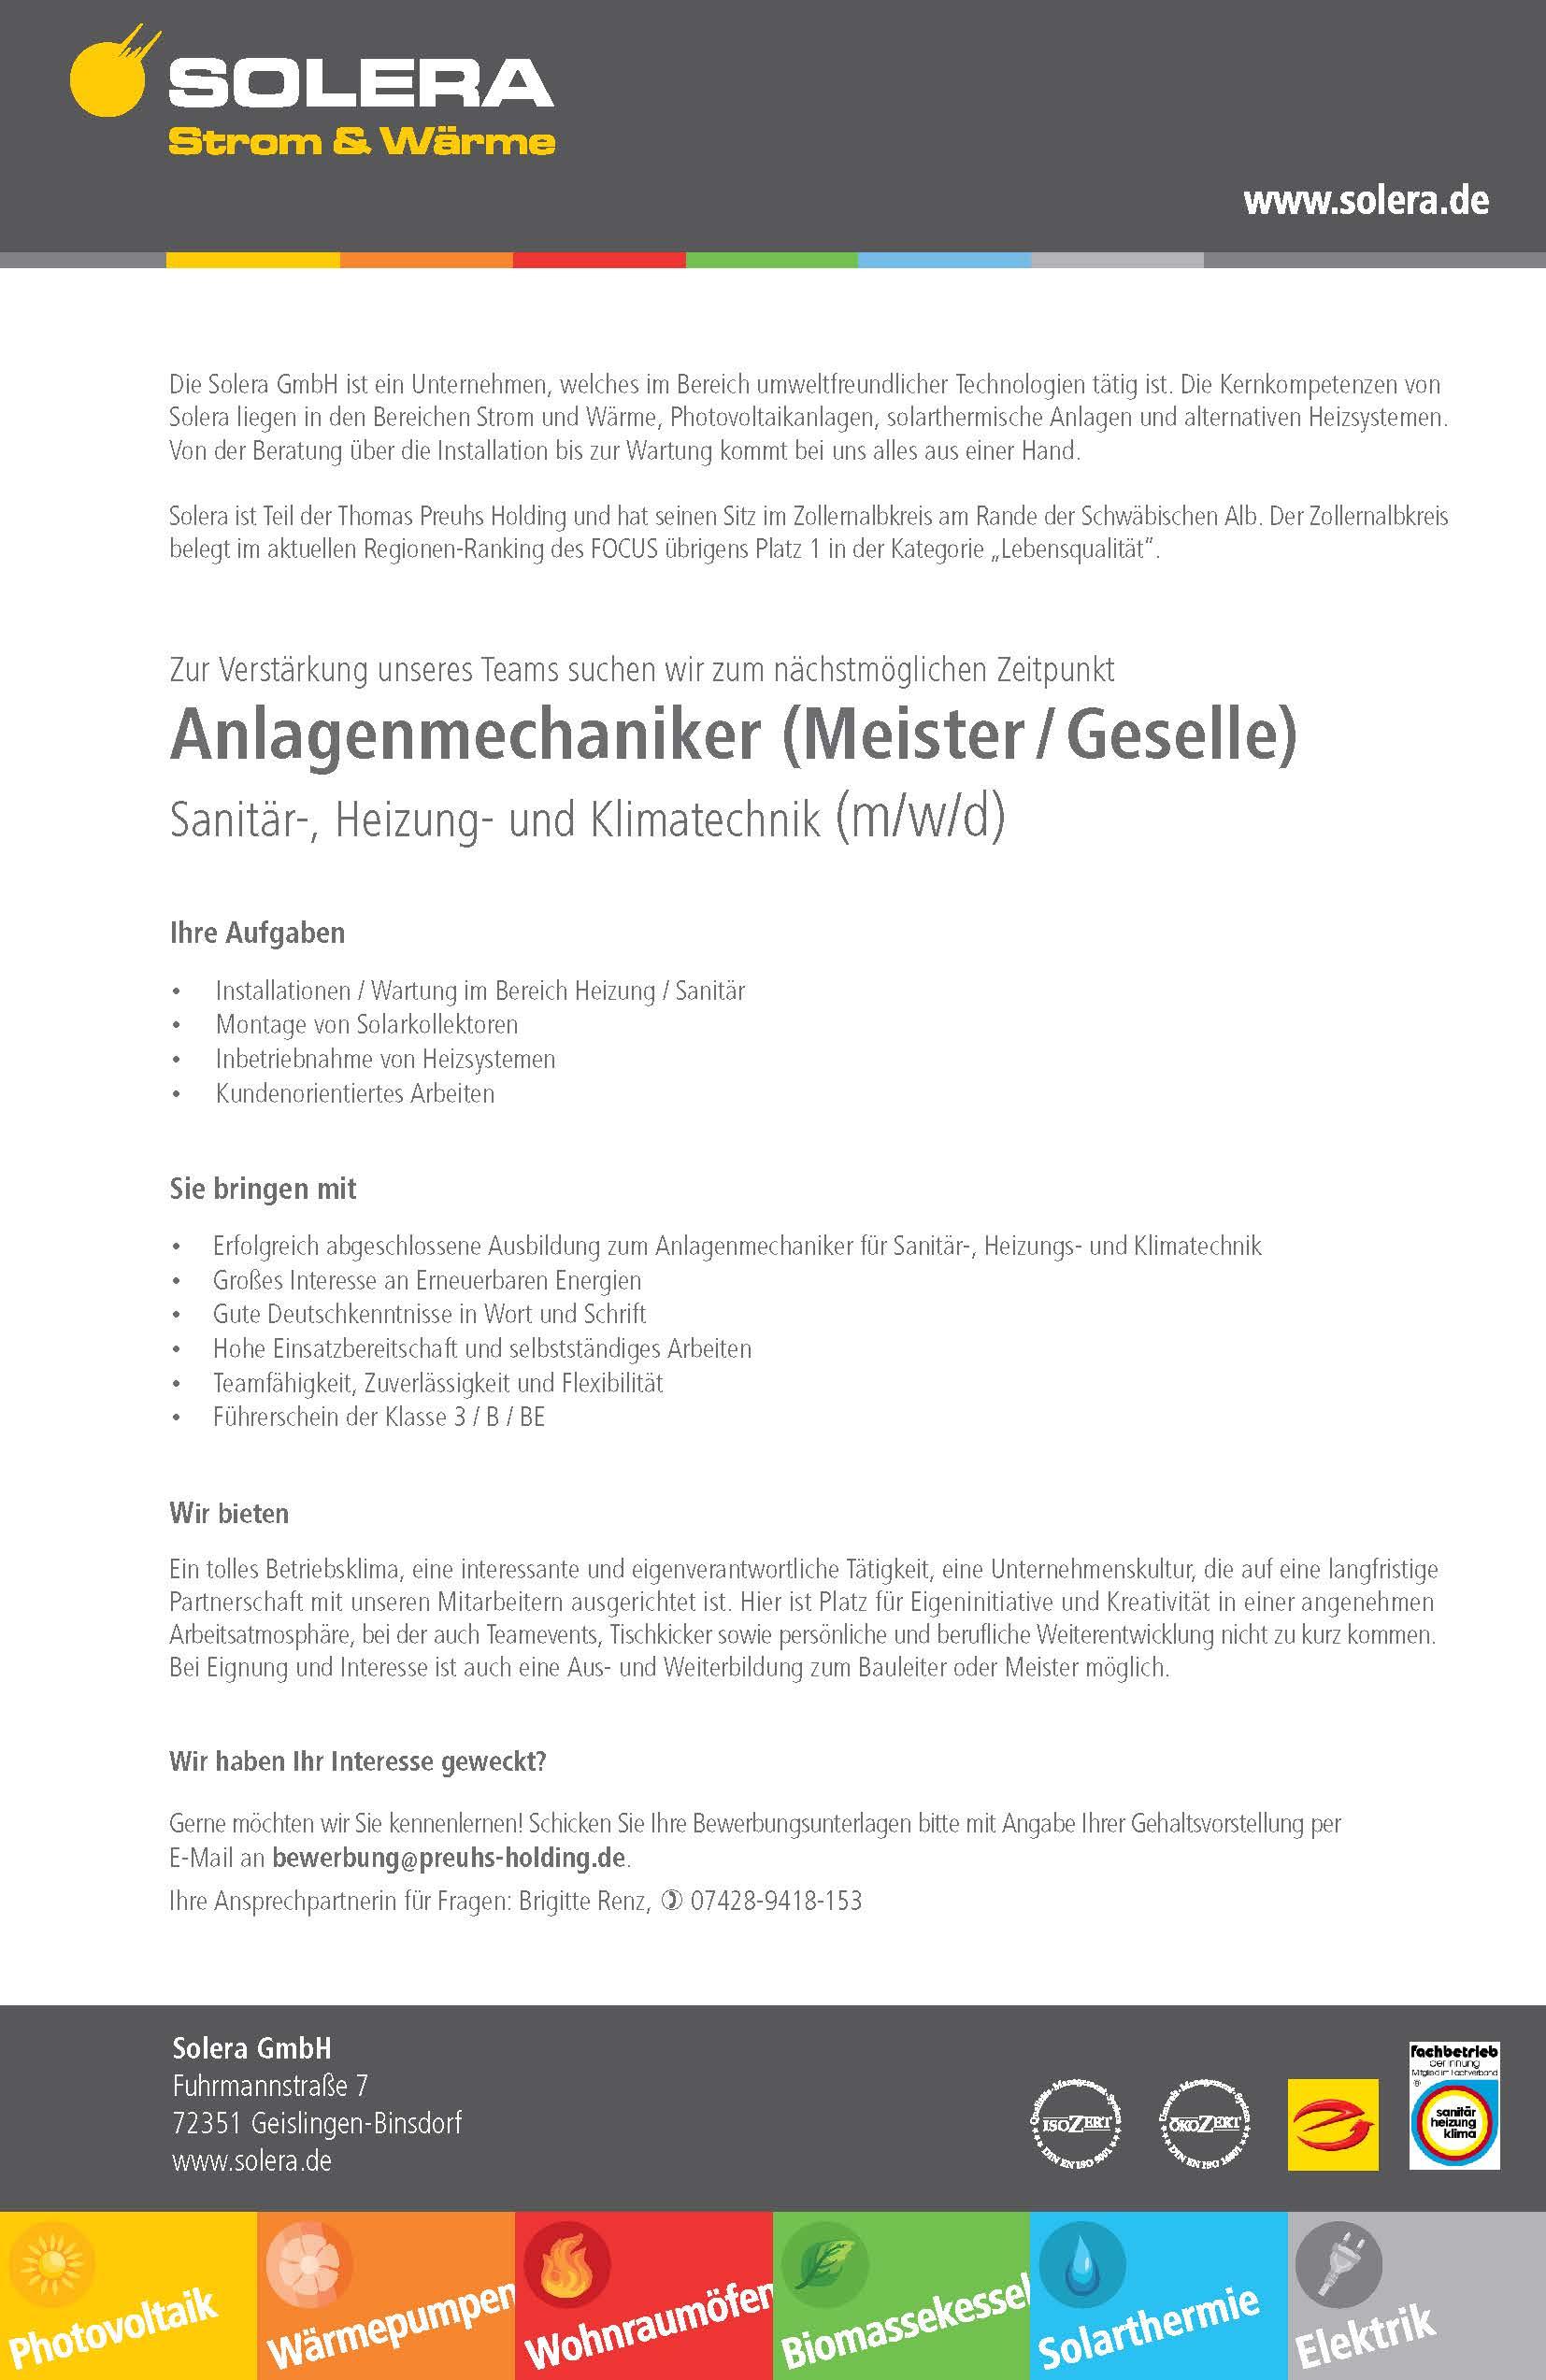 Anlagenmechaniker (Meister/Geselle)